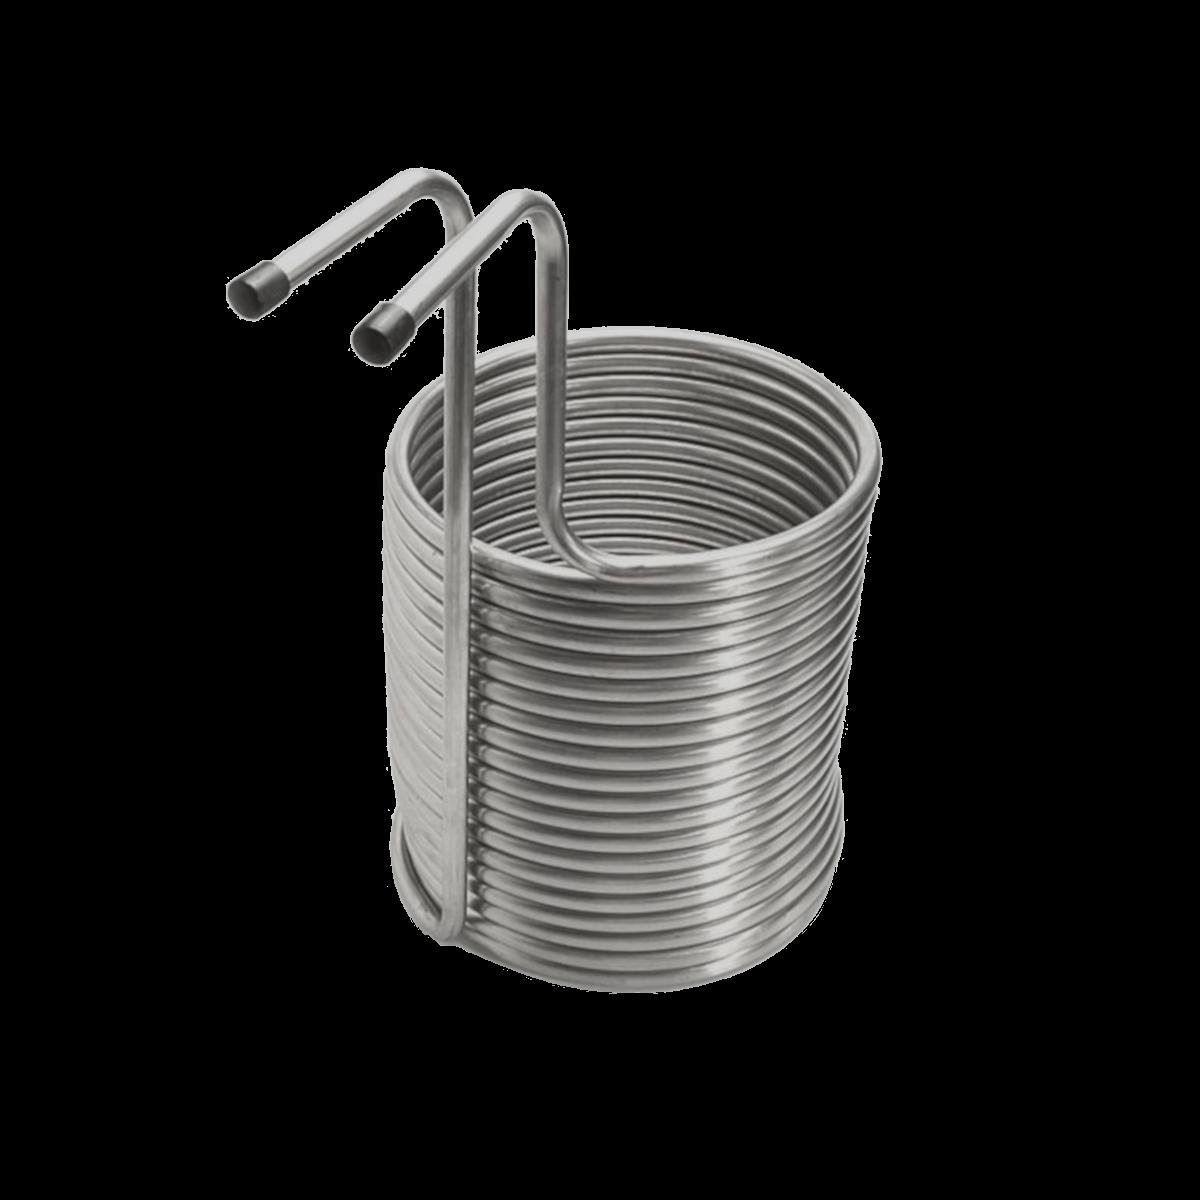 Chiller De Imersão Alumínio 30cm - 10Mts